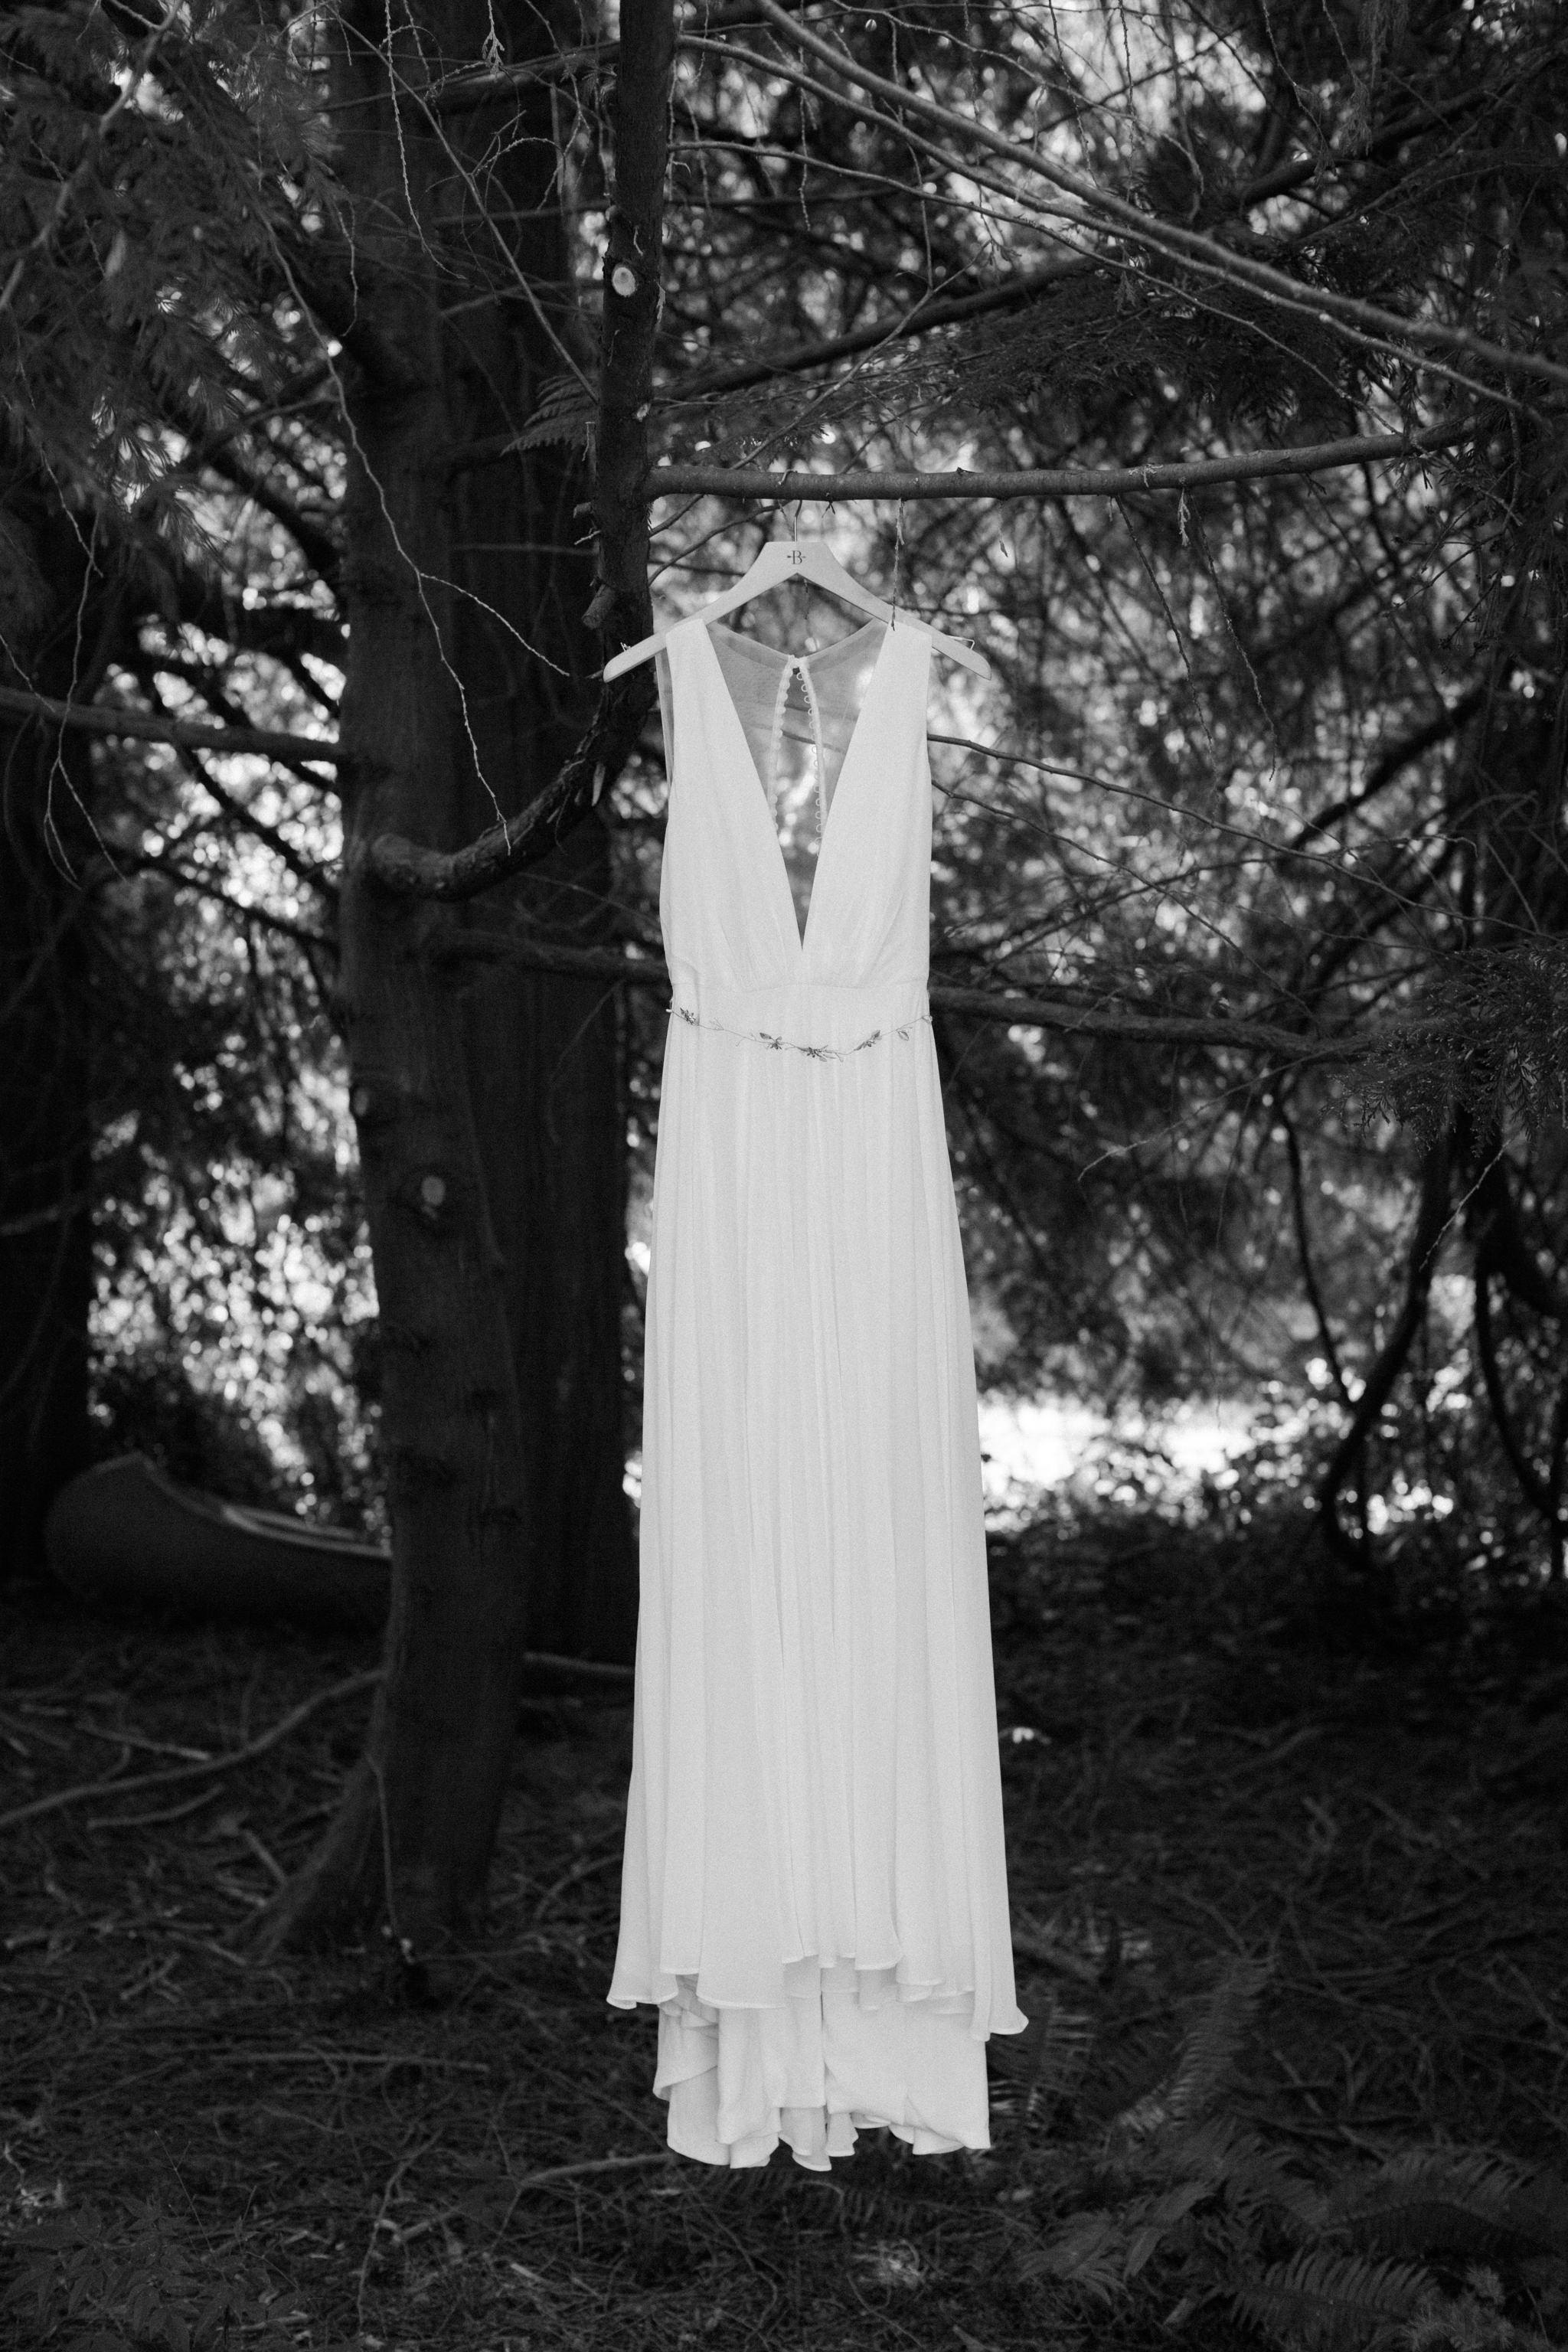 Backyard-Bainbridge-Island-Wedding-Alycia-Lovell-Photography-9.JPG